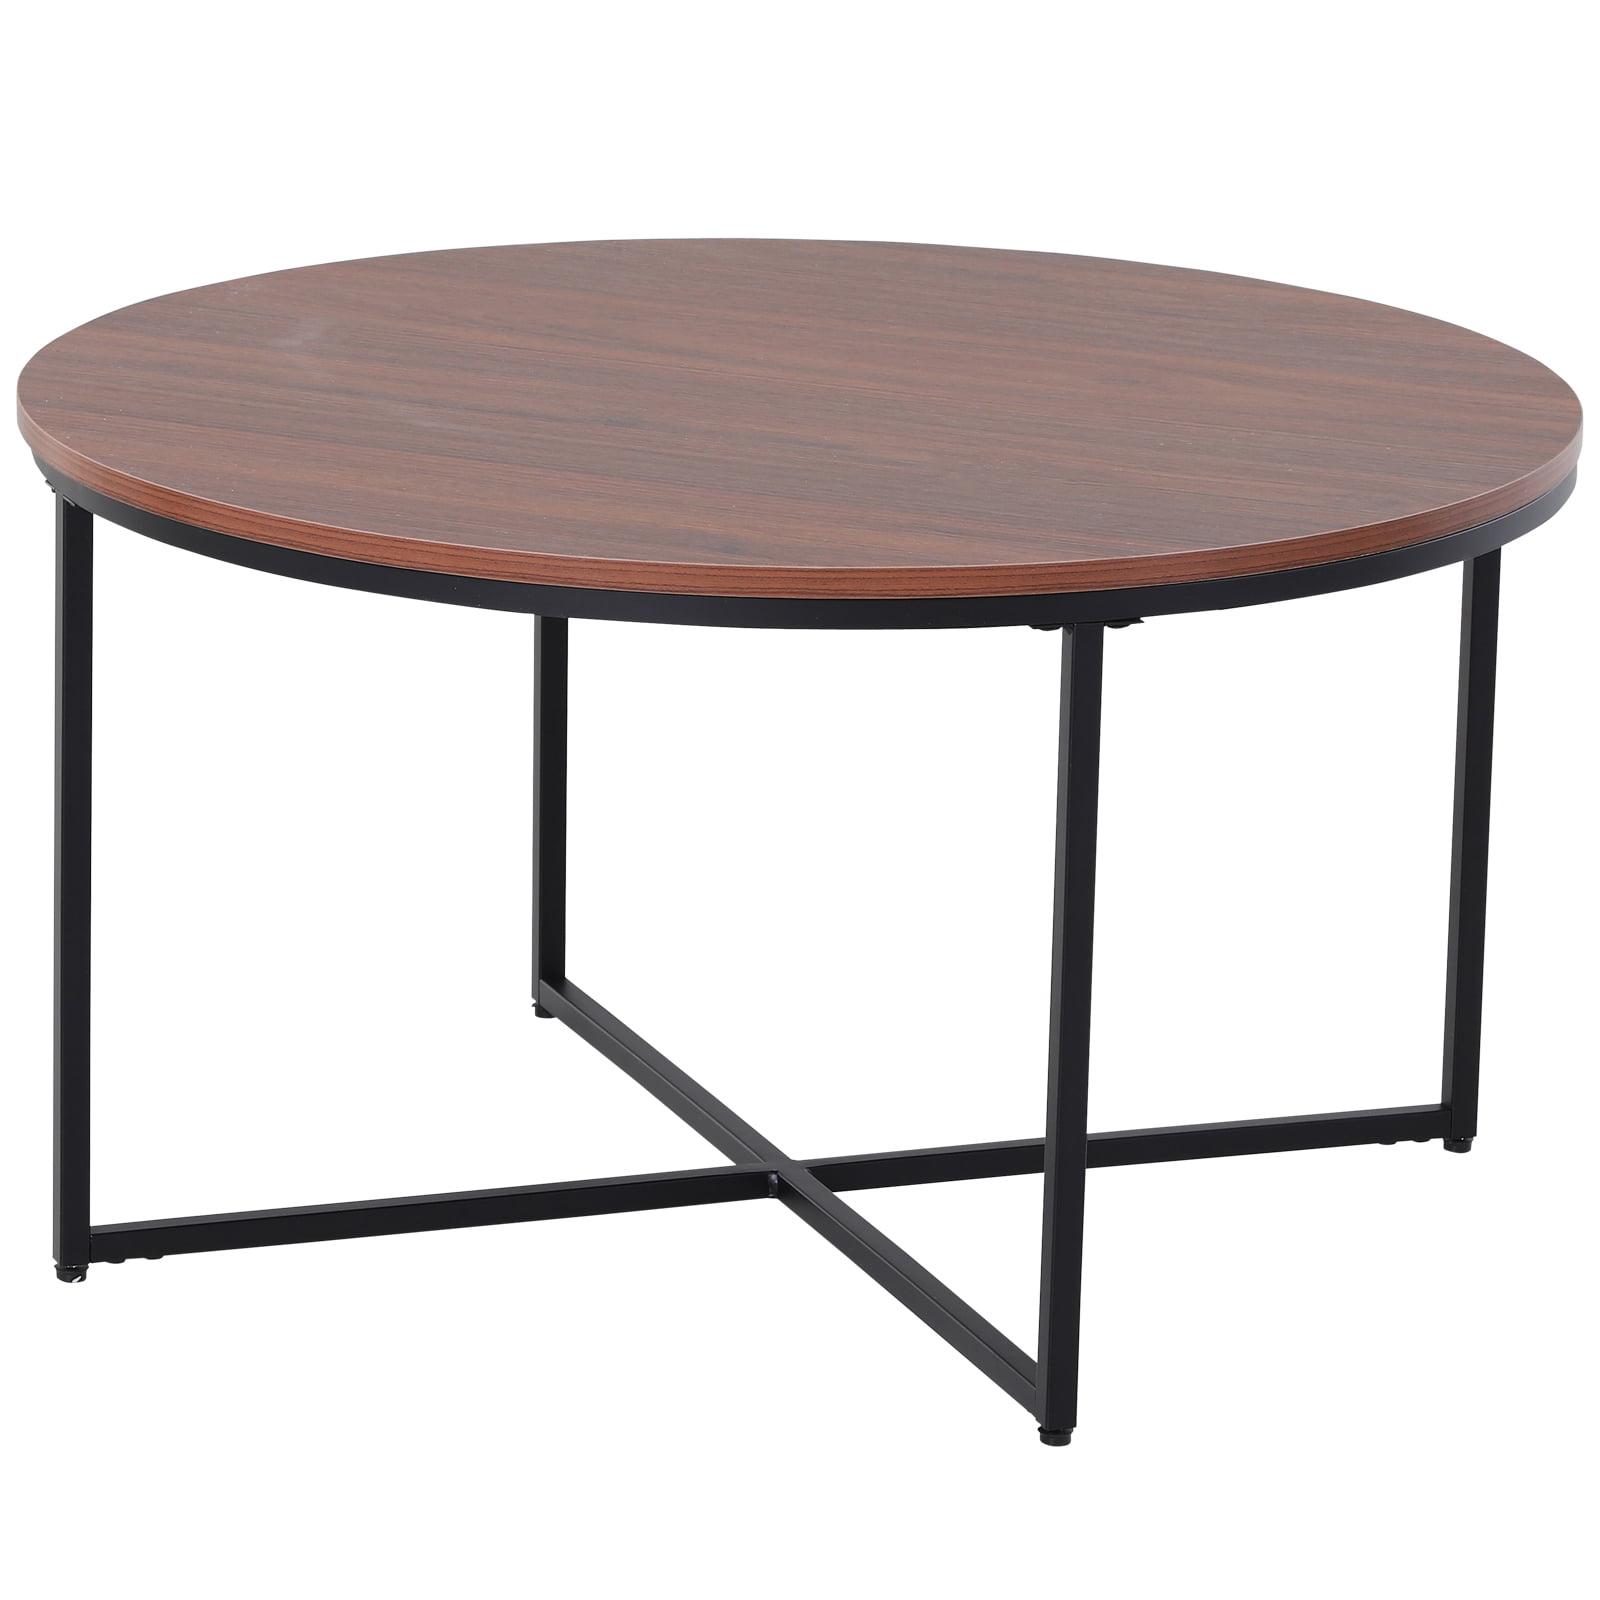 "homcom 315"" round living room coffee table with x base"